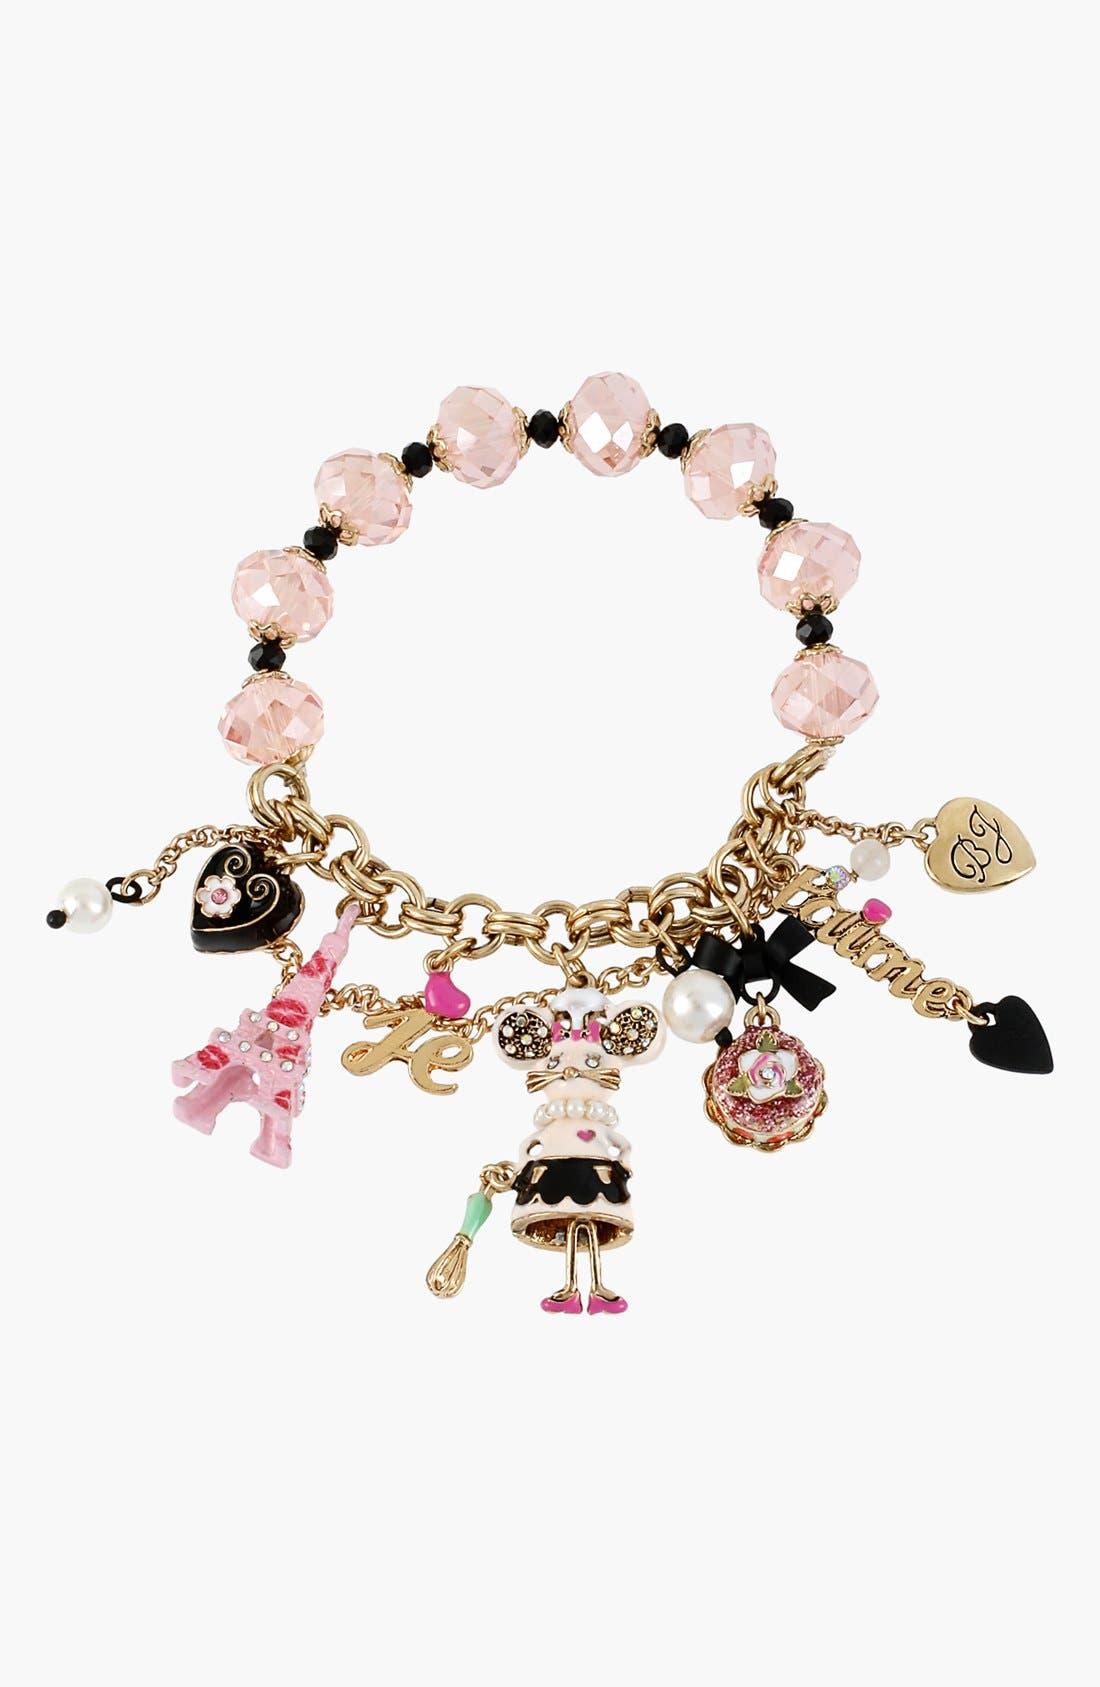 Alternate Image 1 Selected - Betsey Johnson 'Paris' Mouse Charm Stretch Bracelet